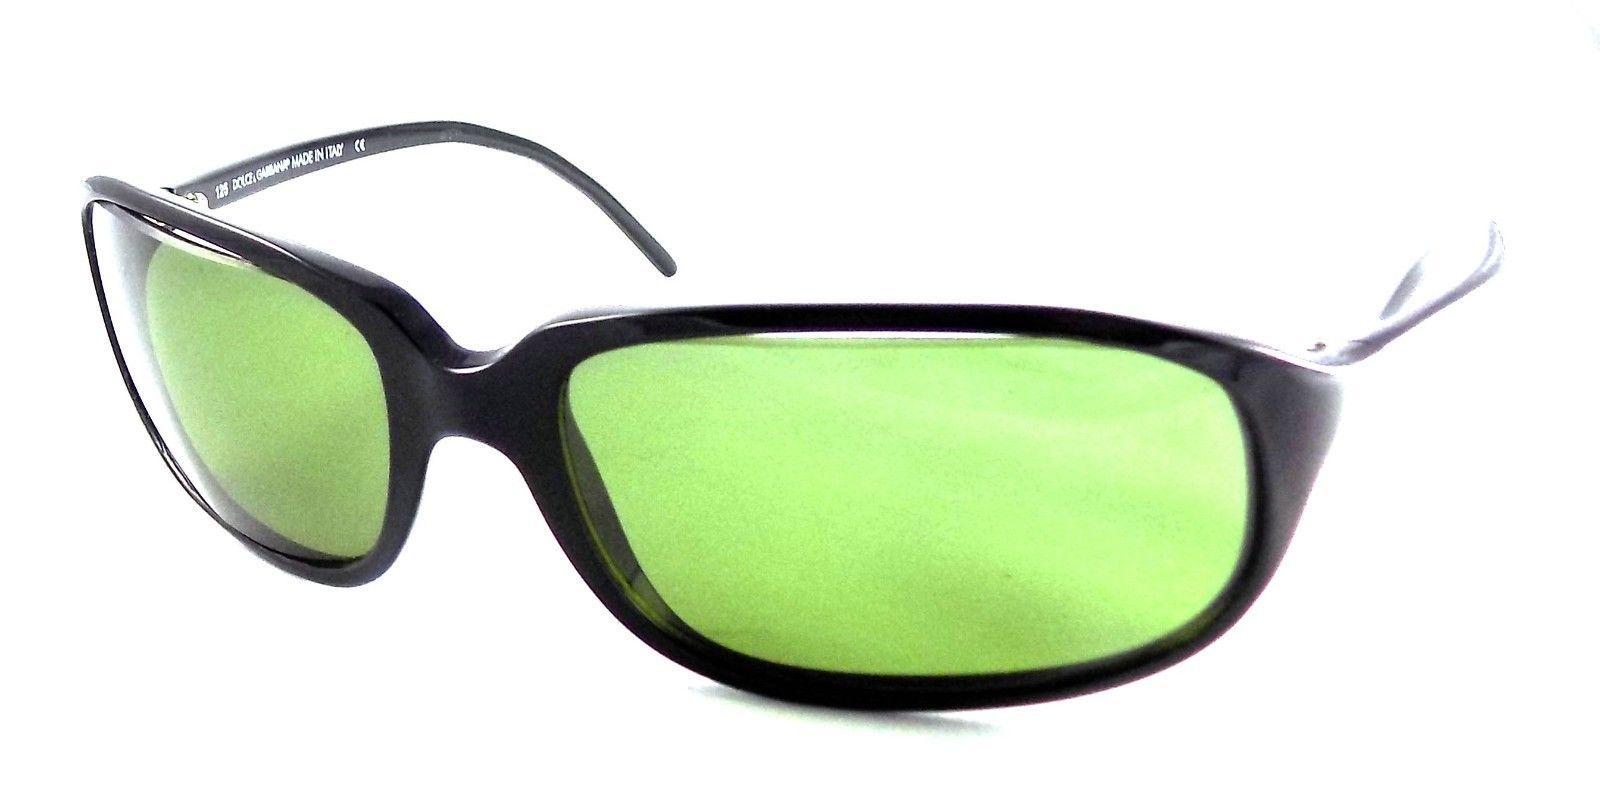 94b7e31f21 Dolce   Gabbana Sunglasses DG 477s 199 and 50 similar items